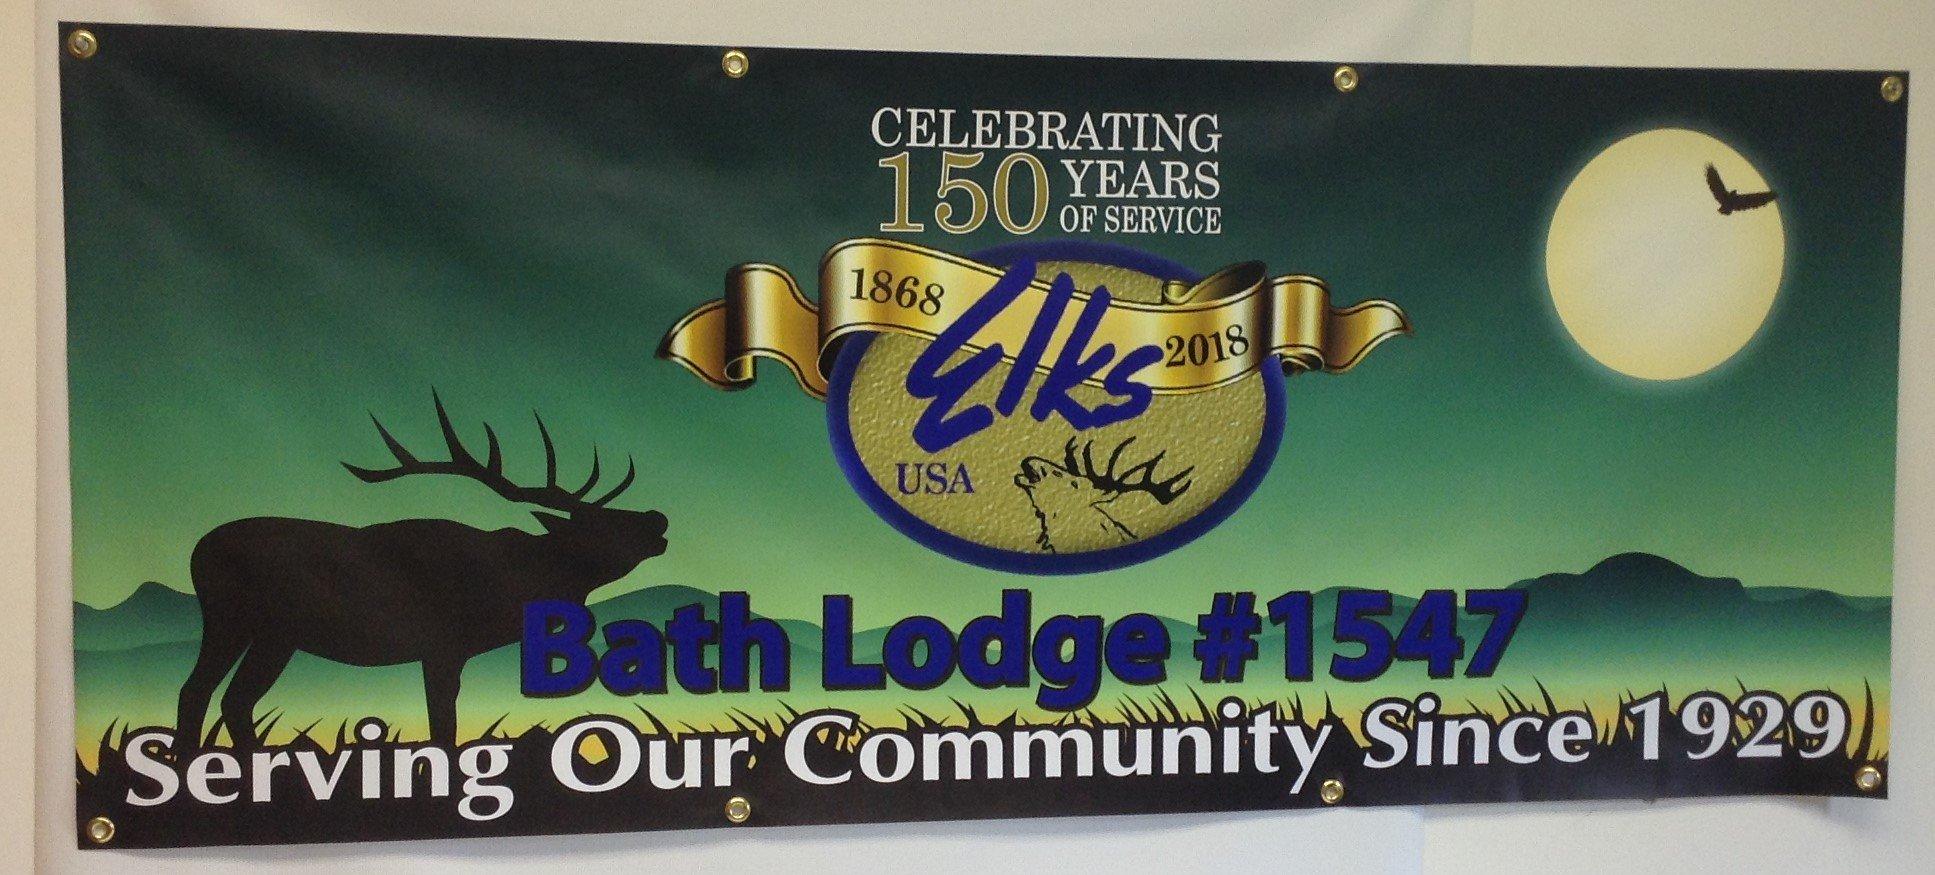 serving community, elks lodge, community, banner